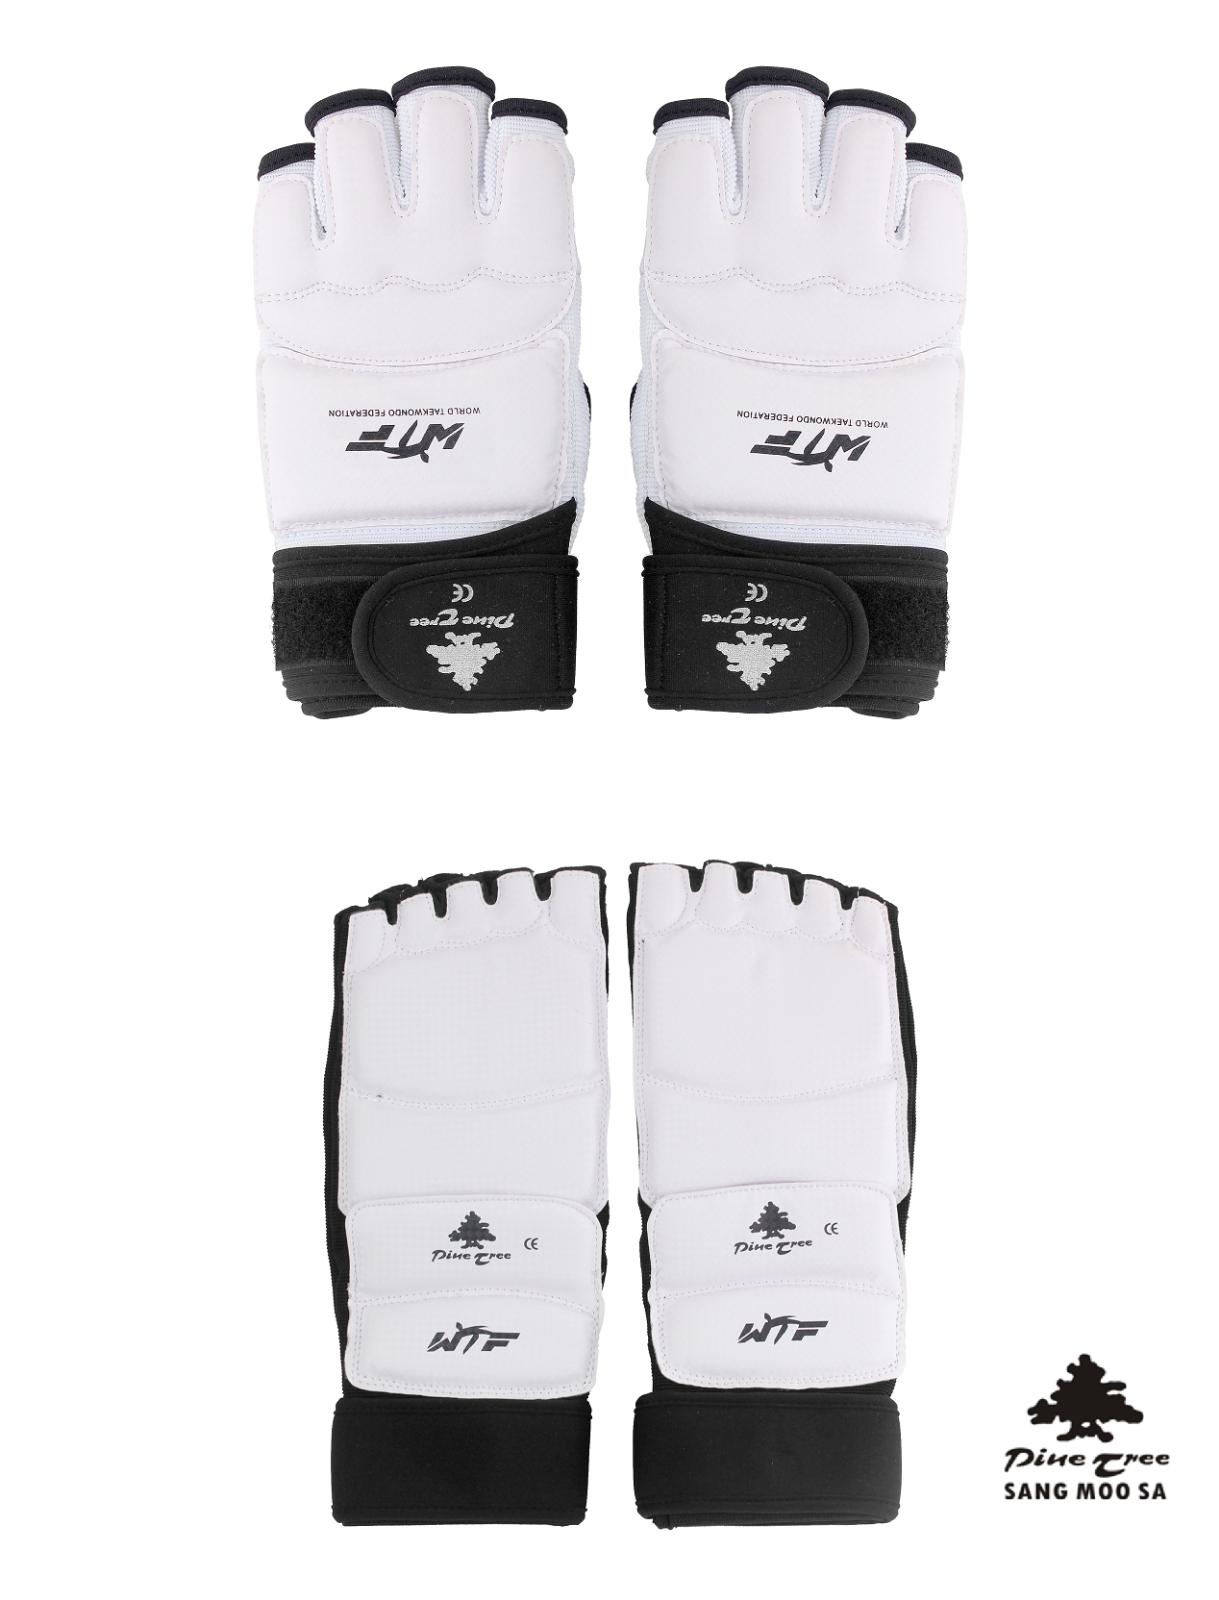 XL Pine Tree TKD Taekwondo Fußschutz Fußschützer Fußschoner WT Protector XS